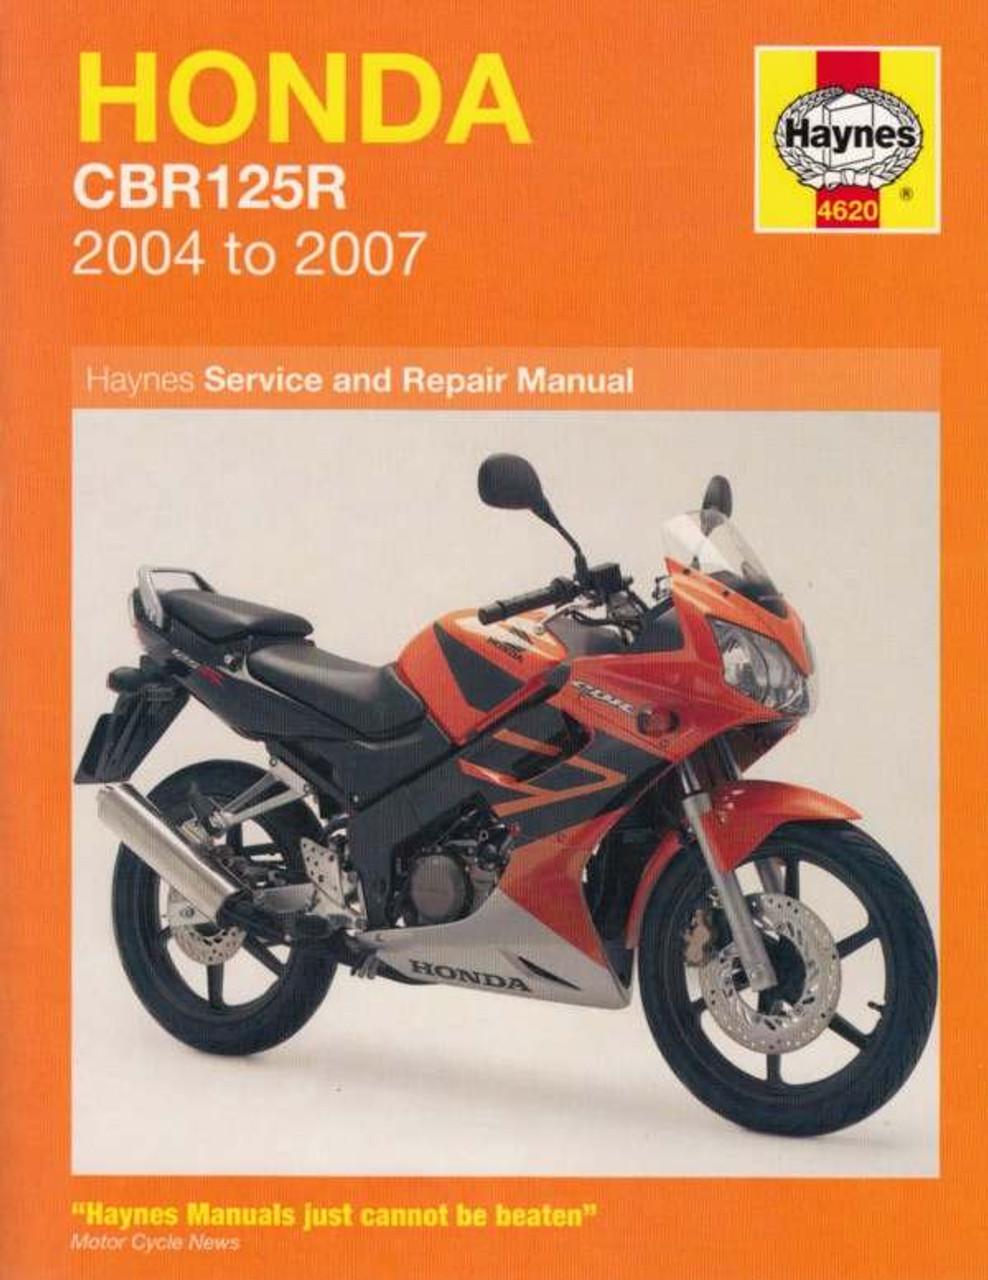 Honda cbf 125 workshop manual pdf